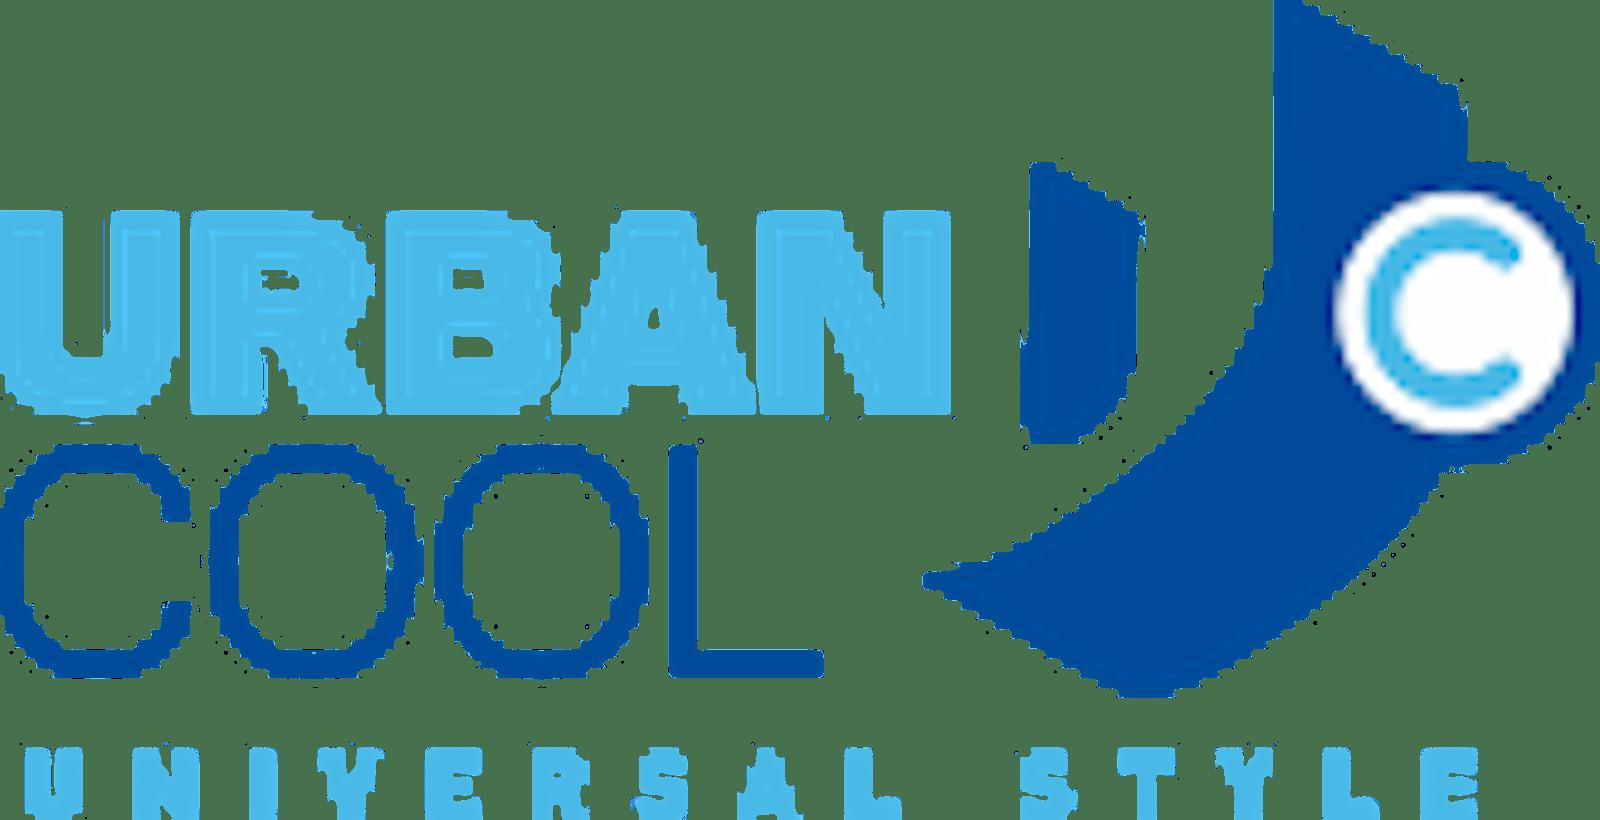 Urban Cool certification